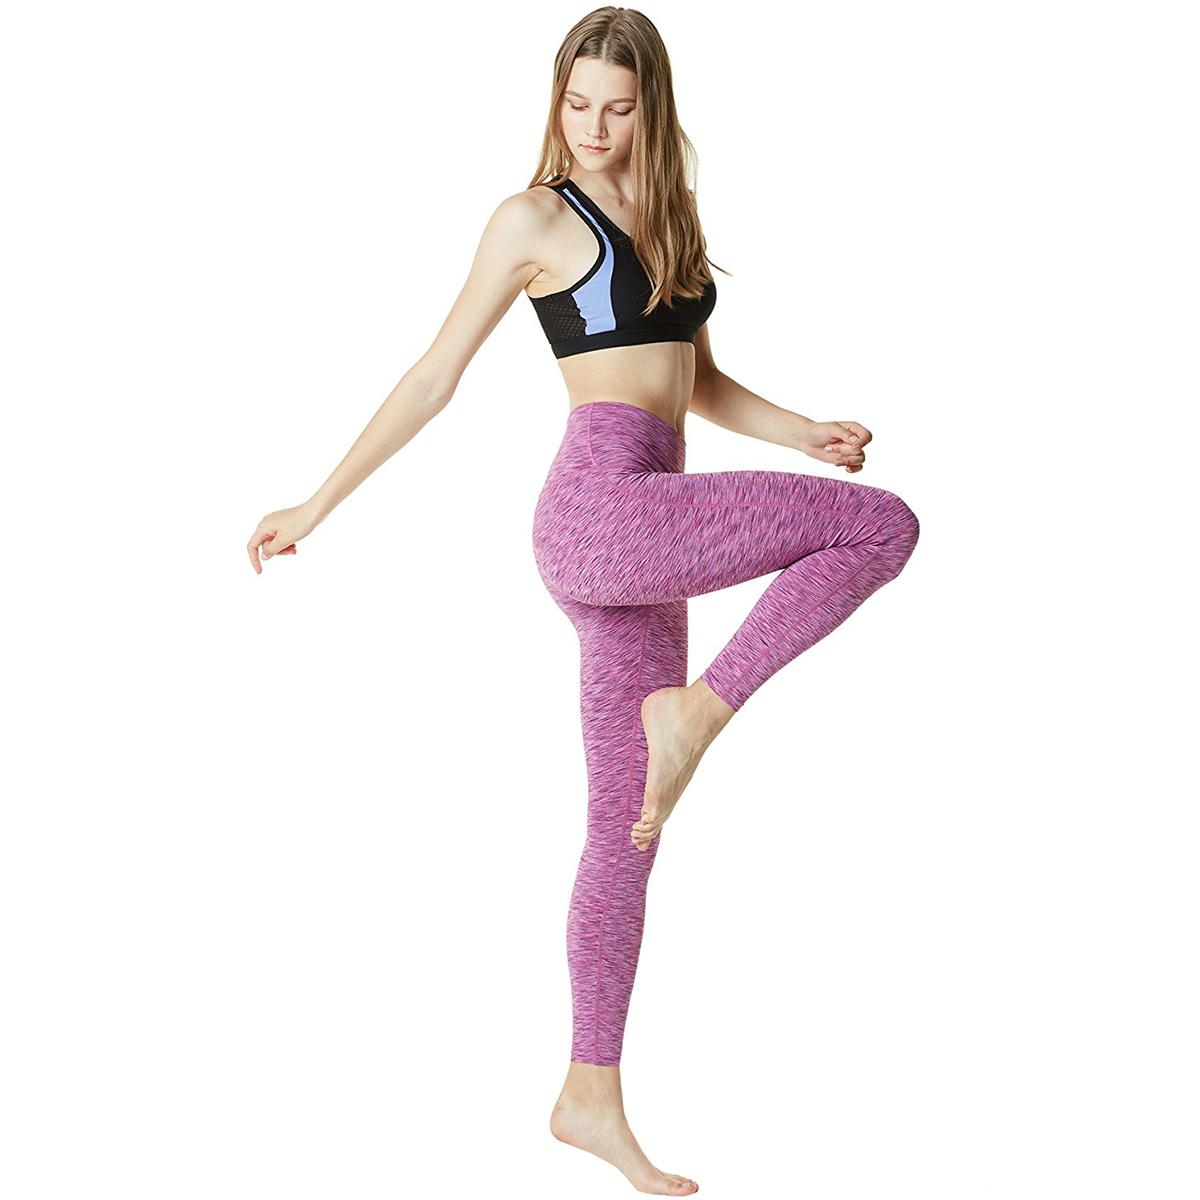 thumbnail 95 - TSLA Tesla FYP42 Women's High-Waisted Ultra-Stretch Tummy Control Yoga Pants